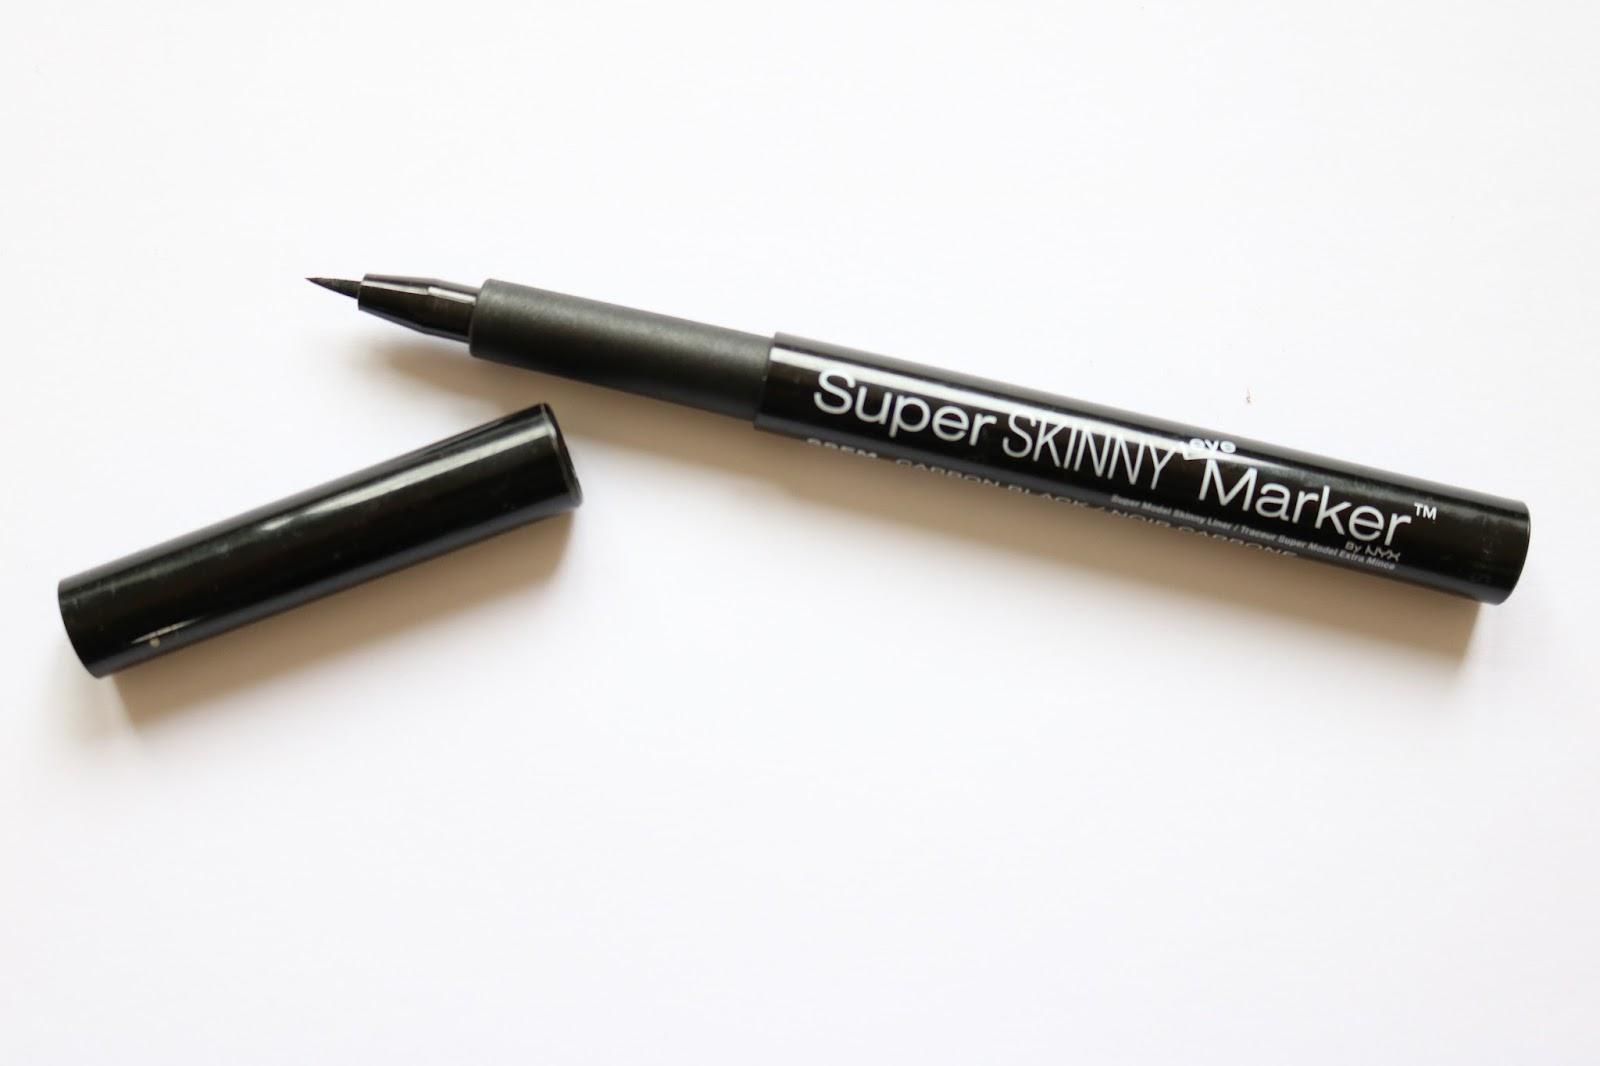 NYX super skinny marker